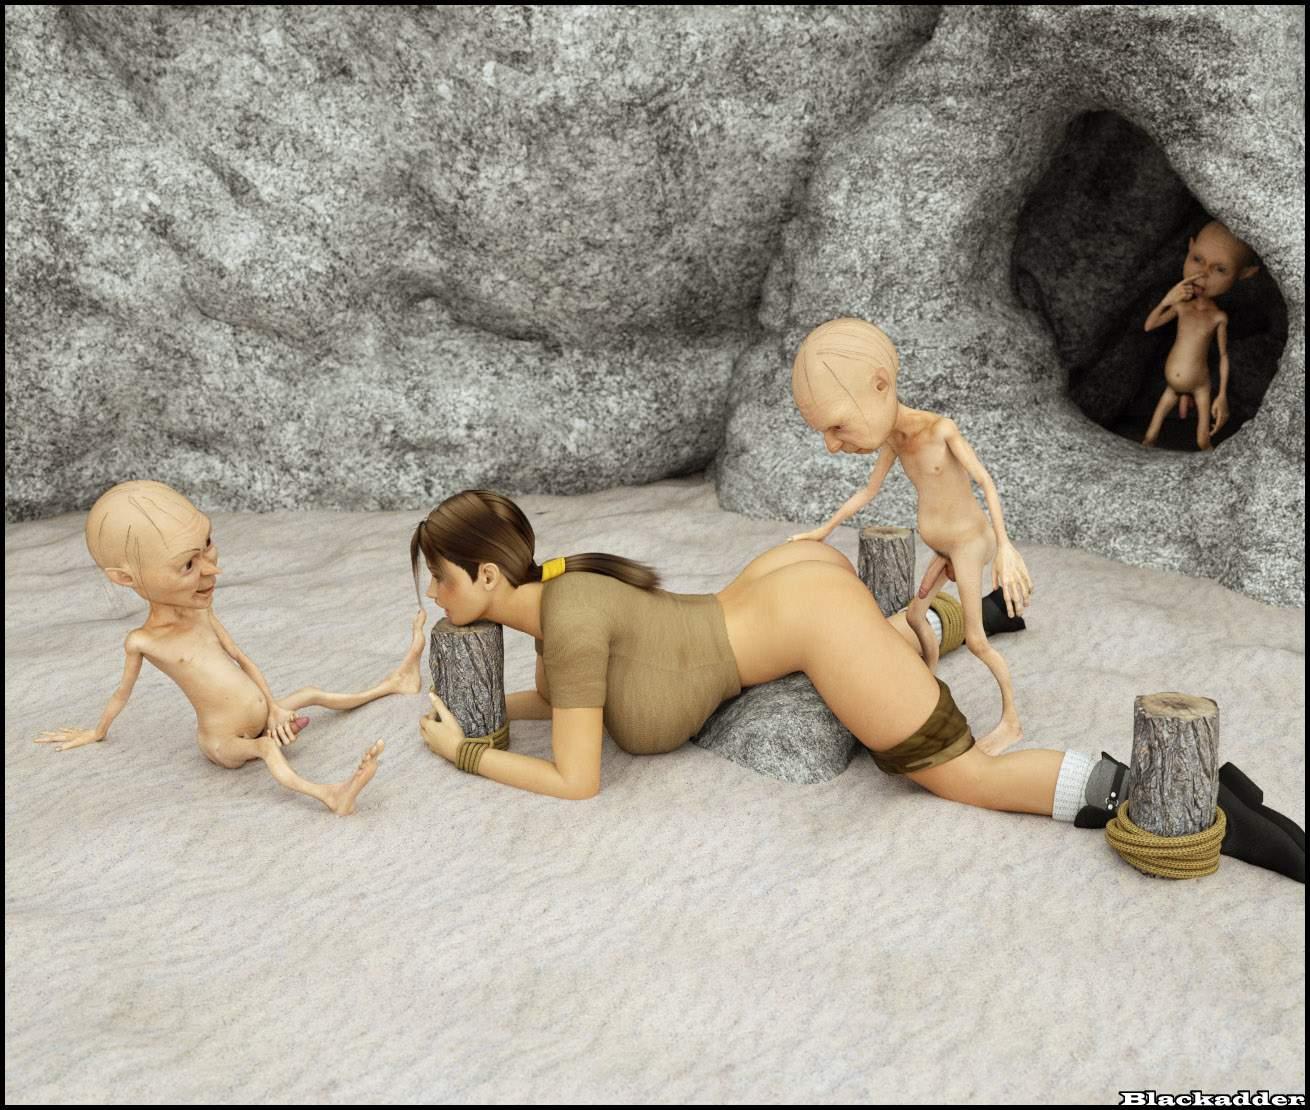 SureFap xxx porno Crossover - [Sasha2000Dog] - Lara in Captivity of Small Gollums